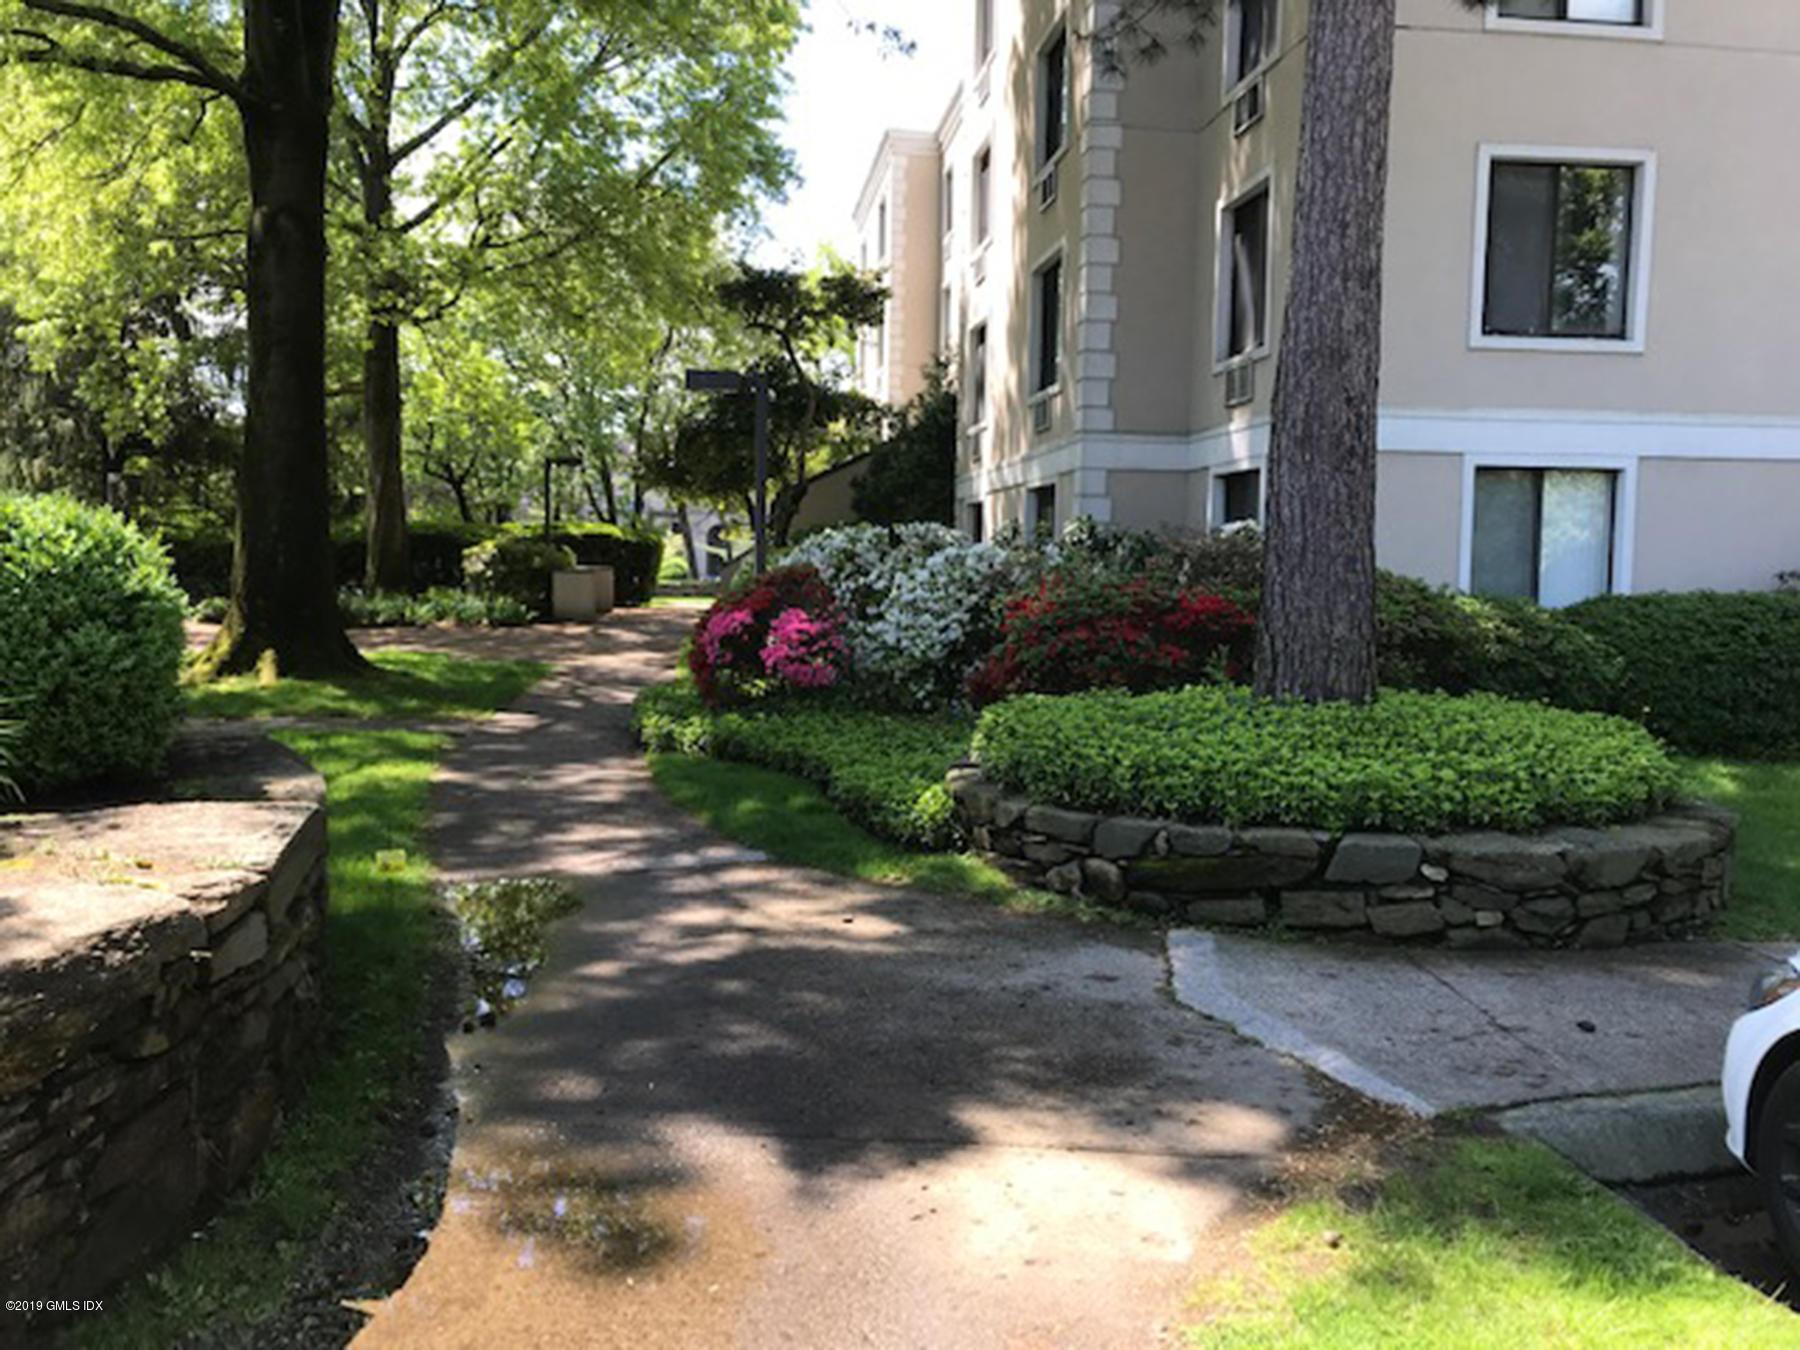 1525 Putnam Avenue,Old Greenwich,Connecticut 06870,1 Bedroom Bedrooms,1 BathroomBathrooms,Condominium,Putnam,107323